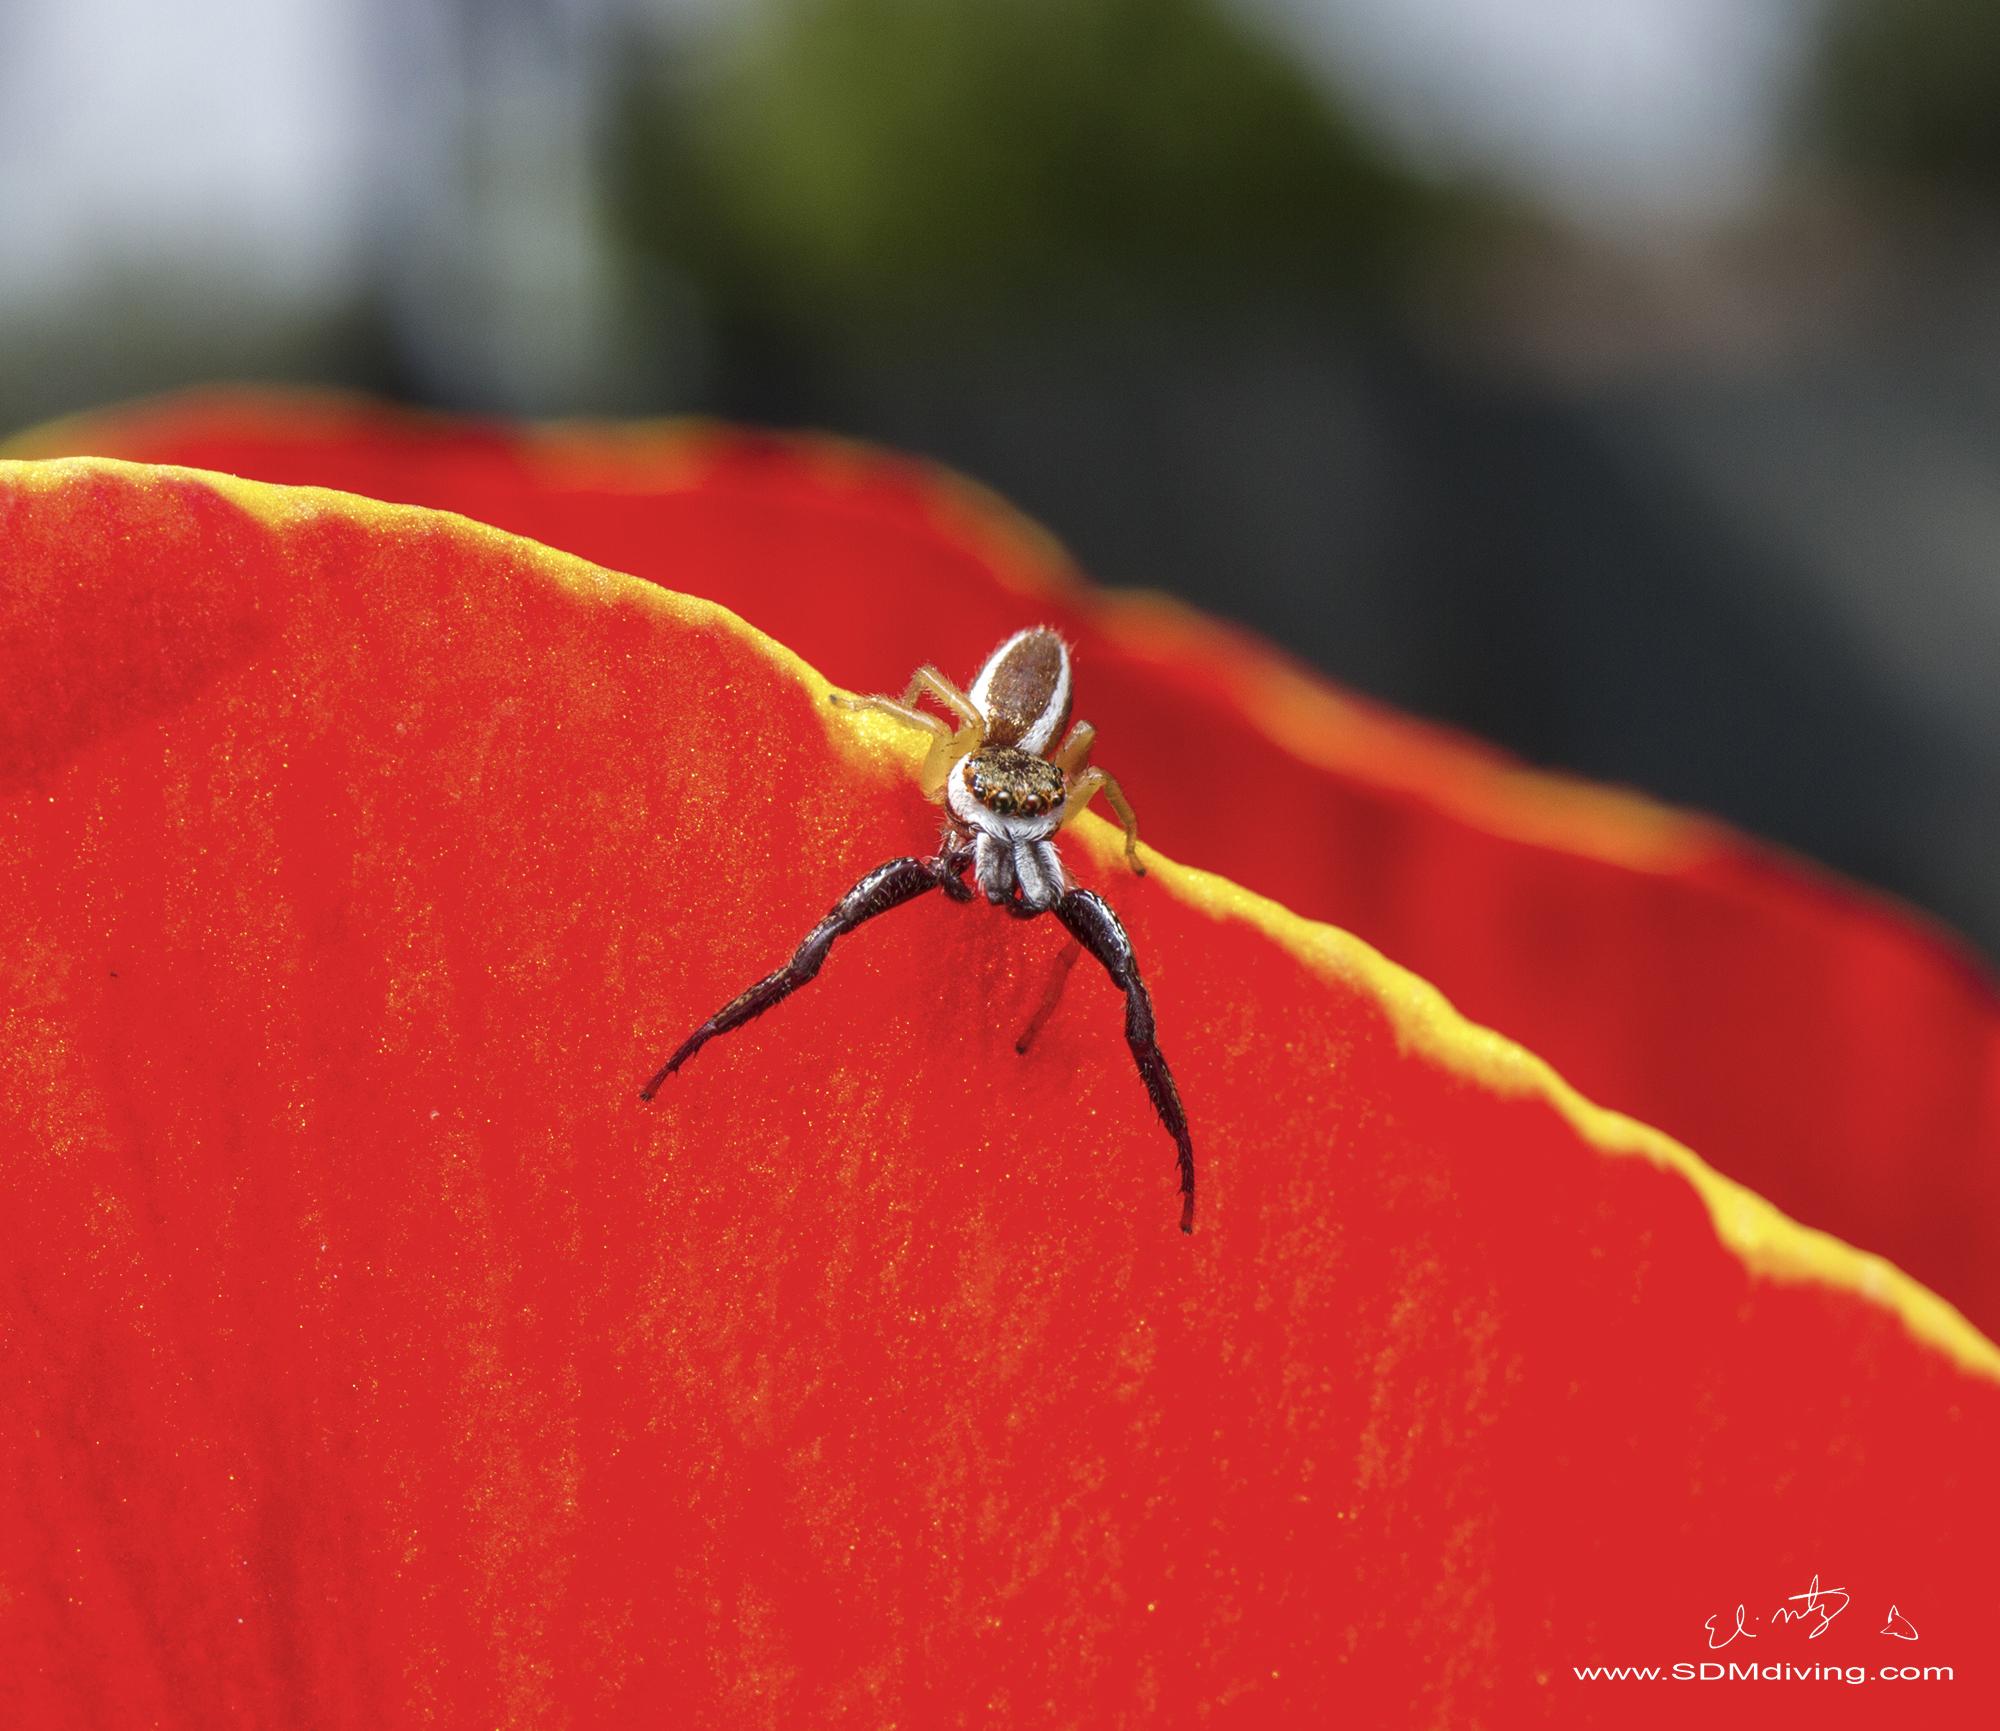 17. Jumping Spider